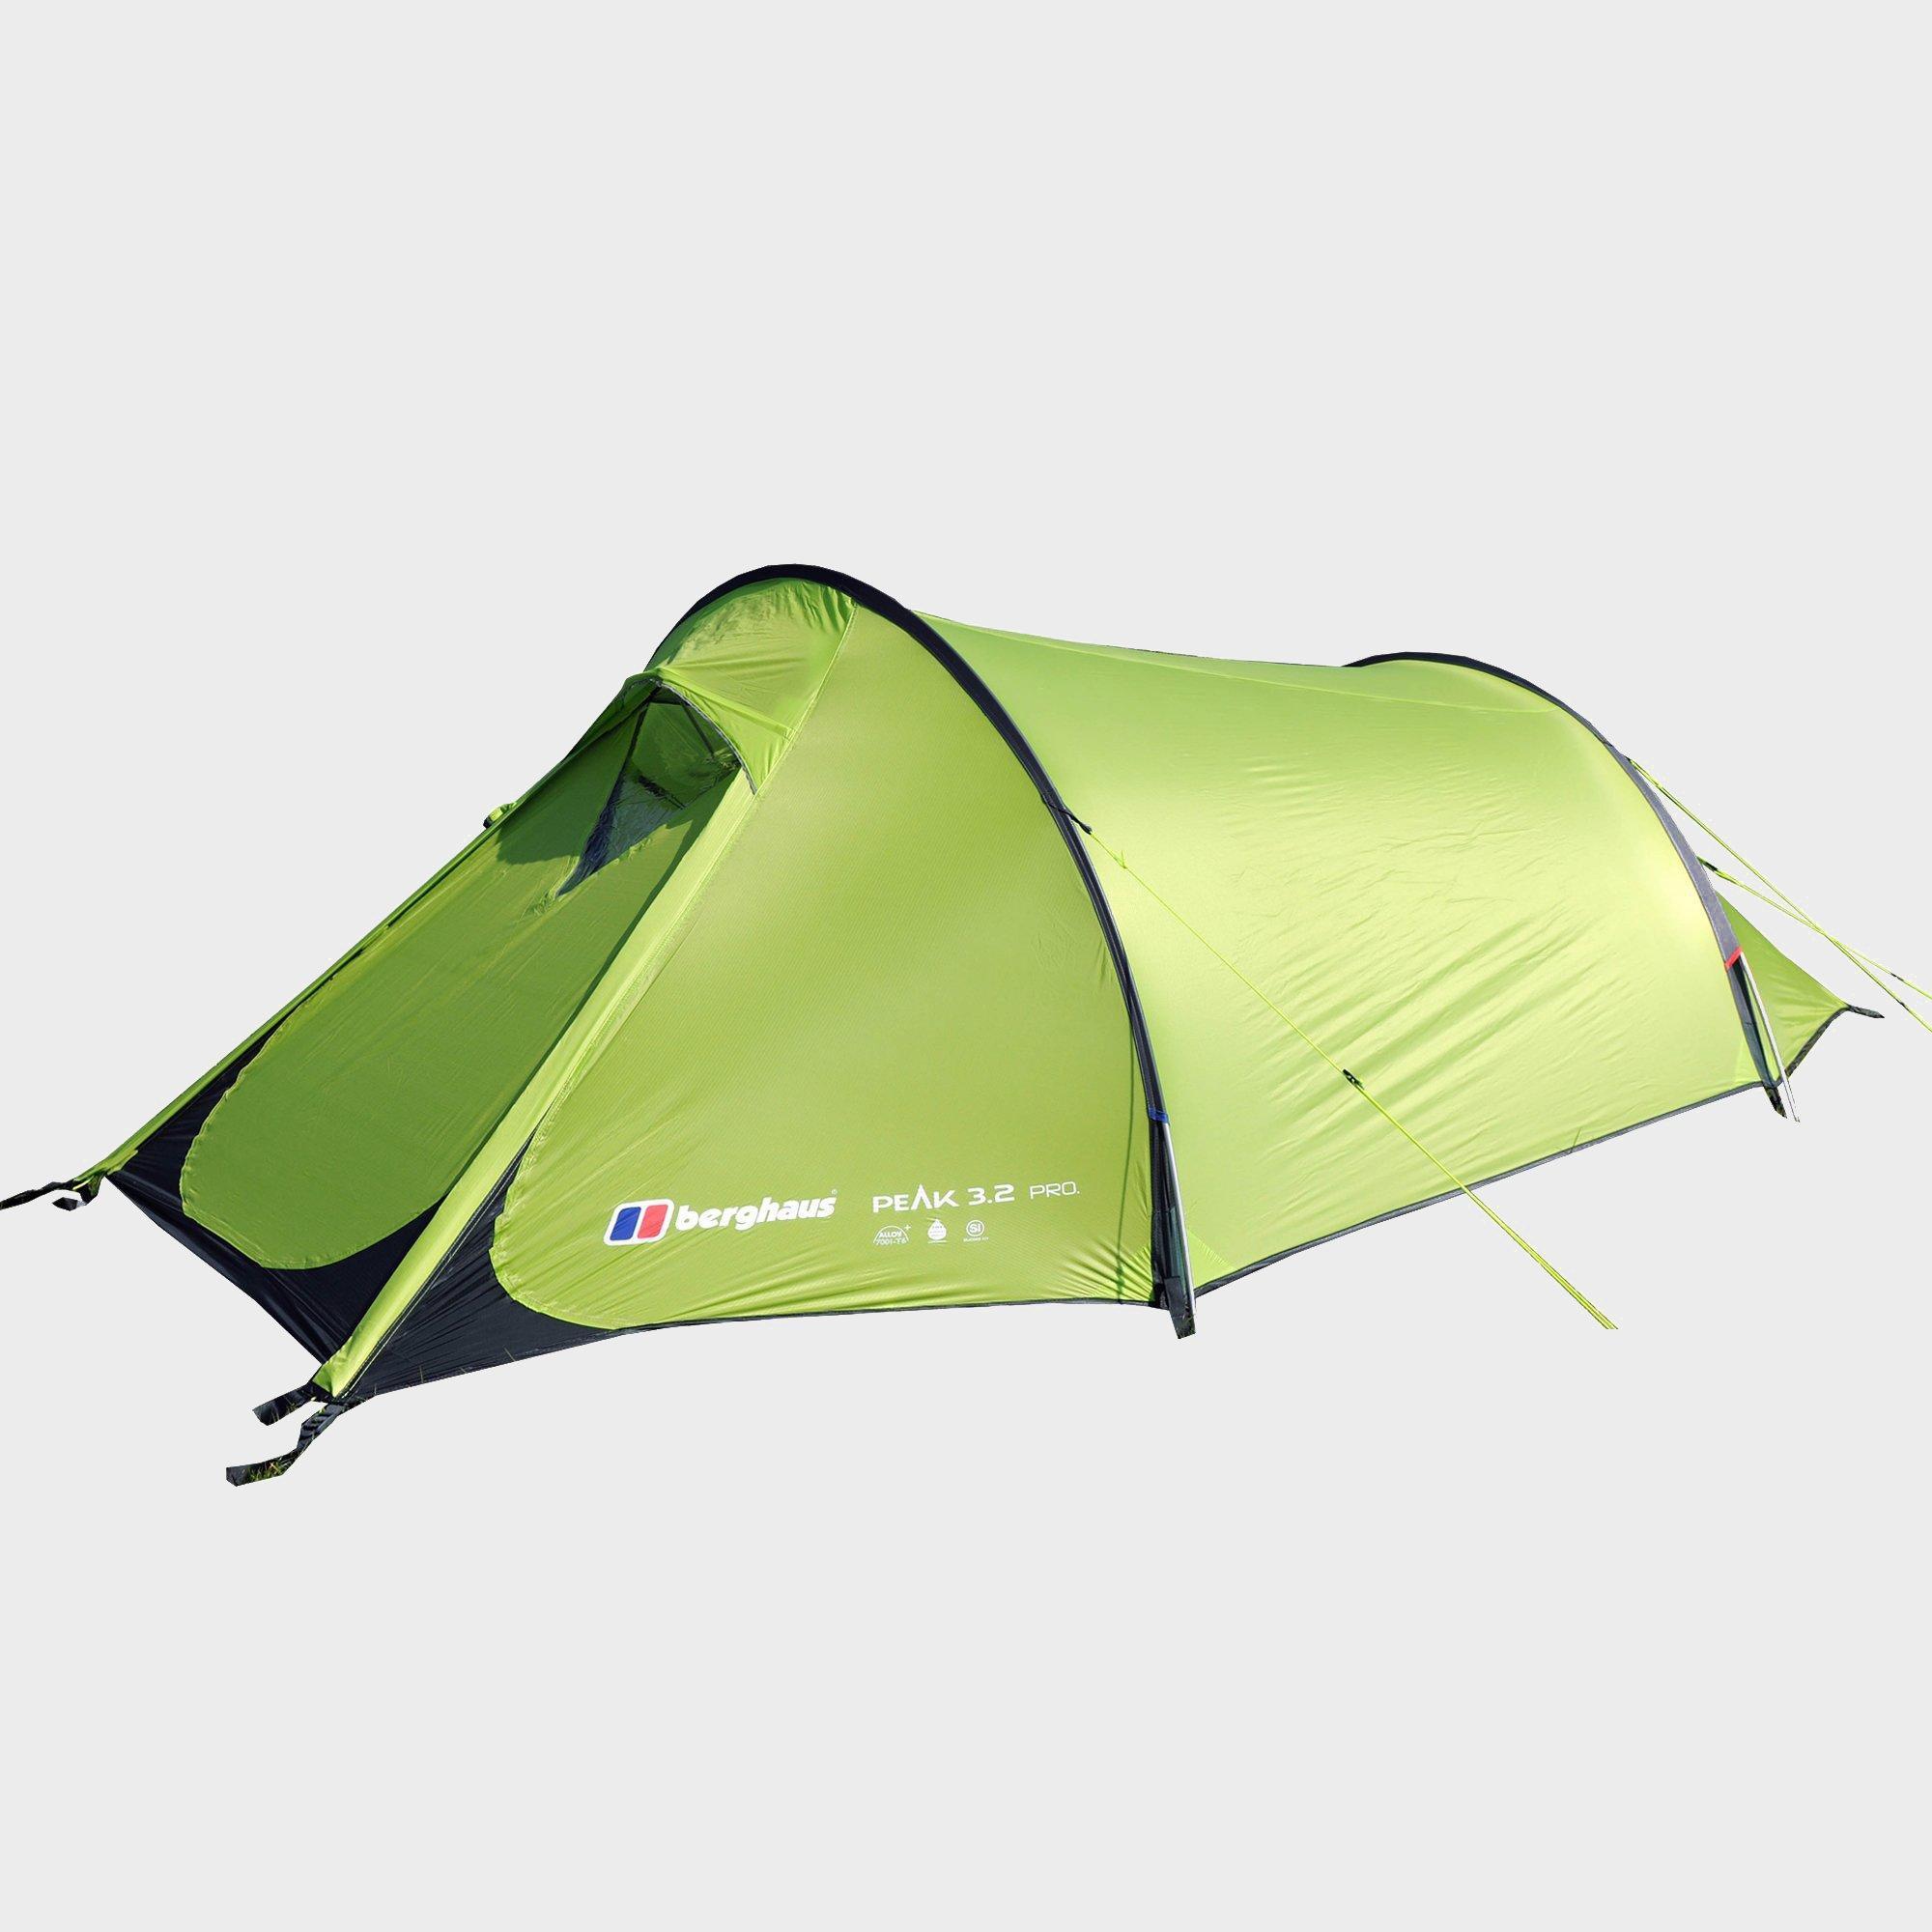 Berghaus Peak 3.2 Pro Tent  Green Green